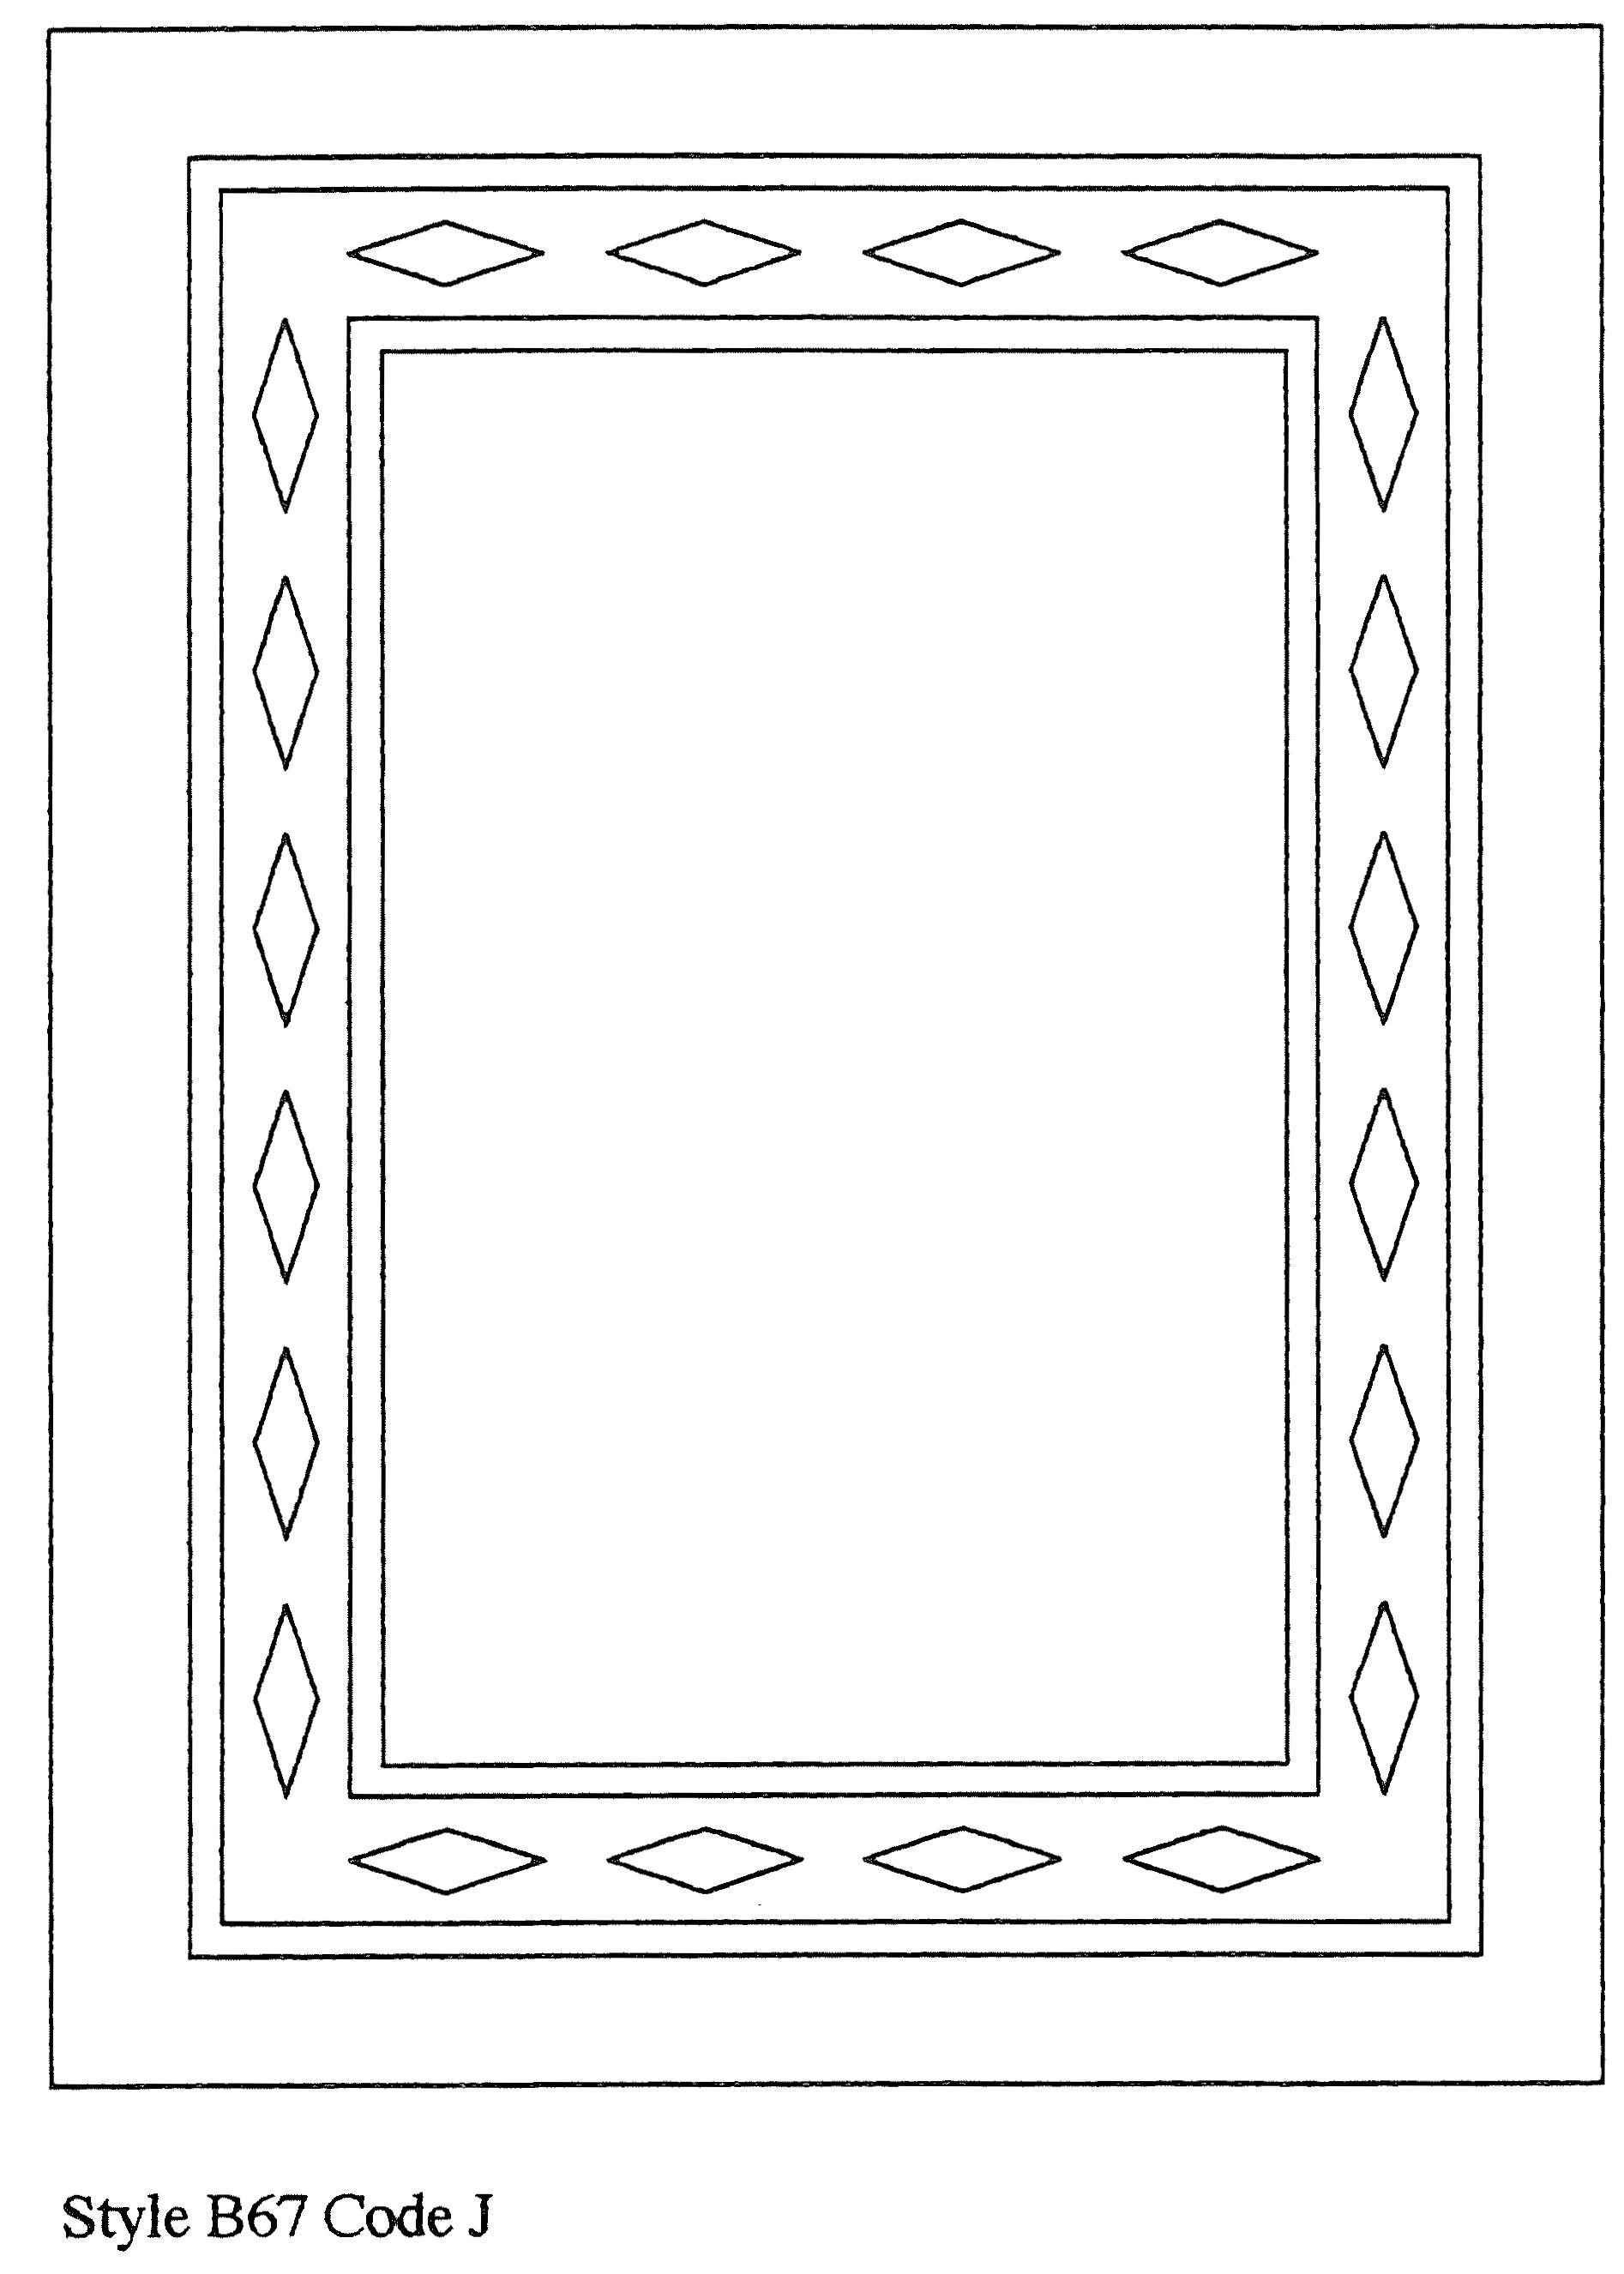 P7-B67.jpg